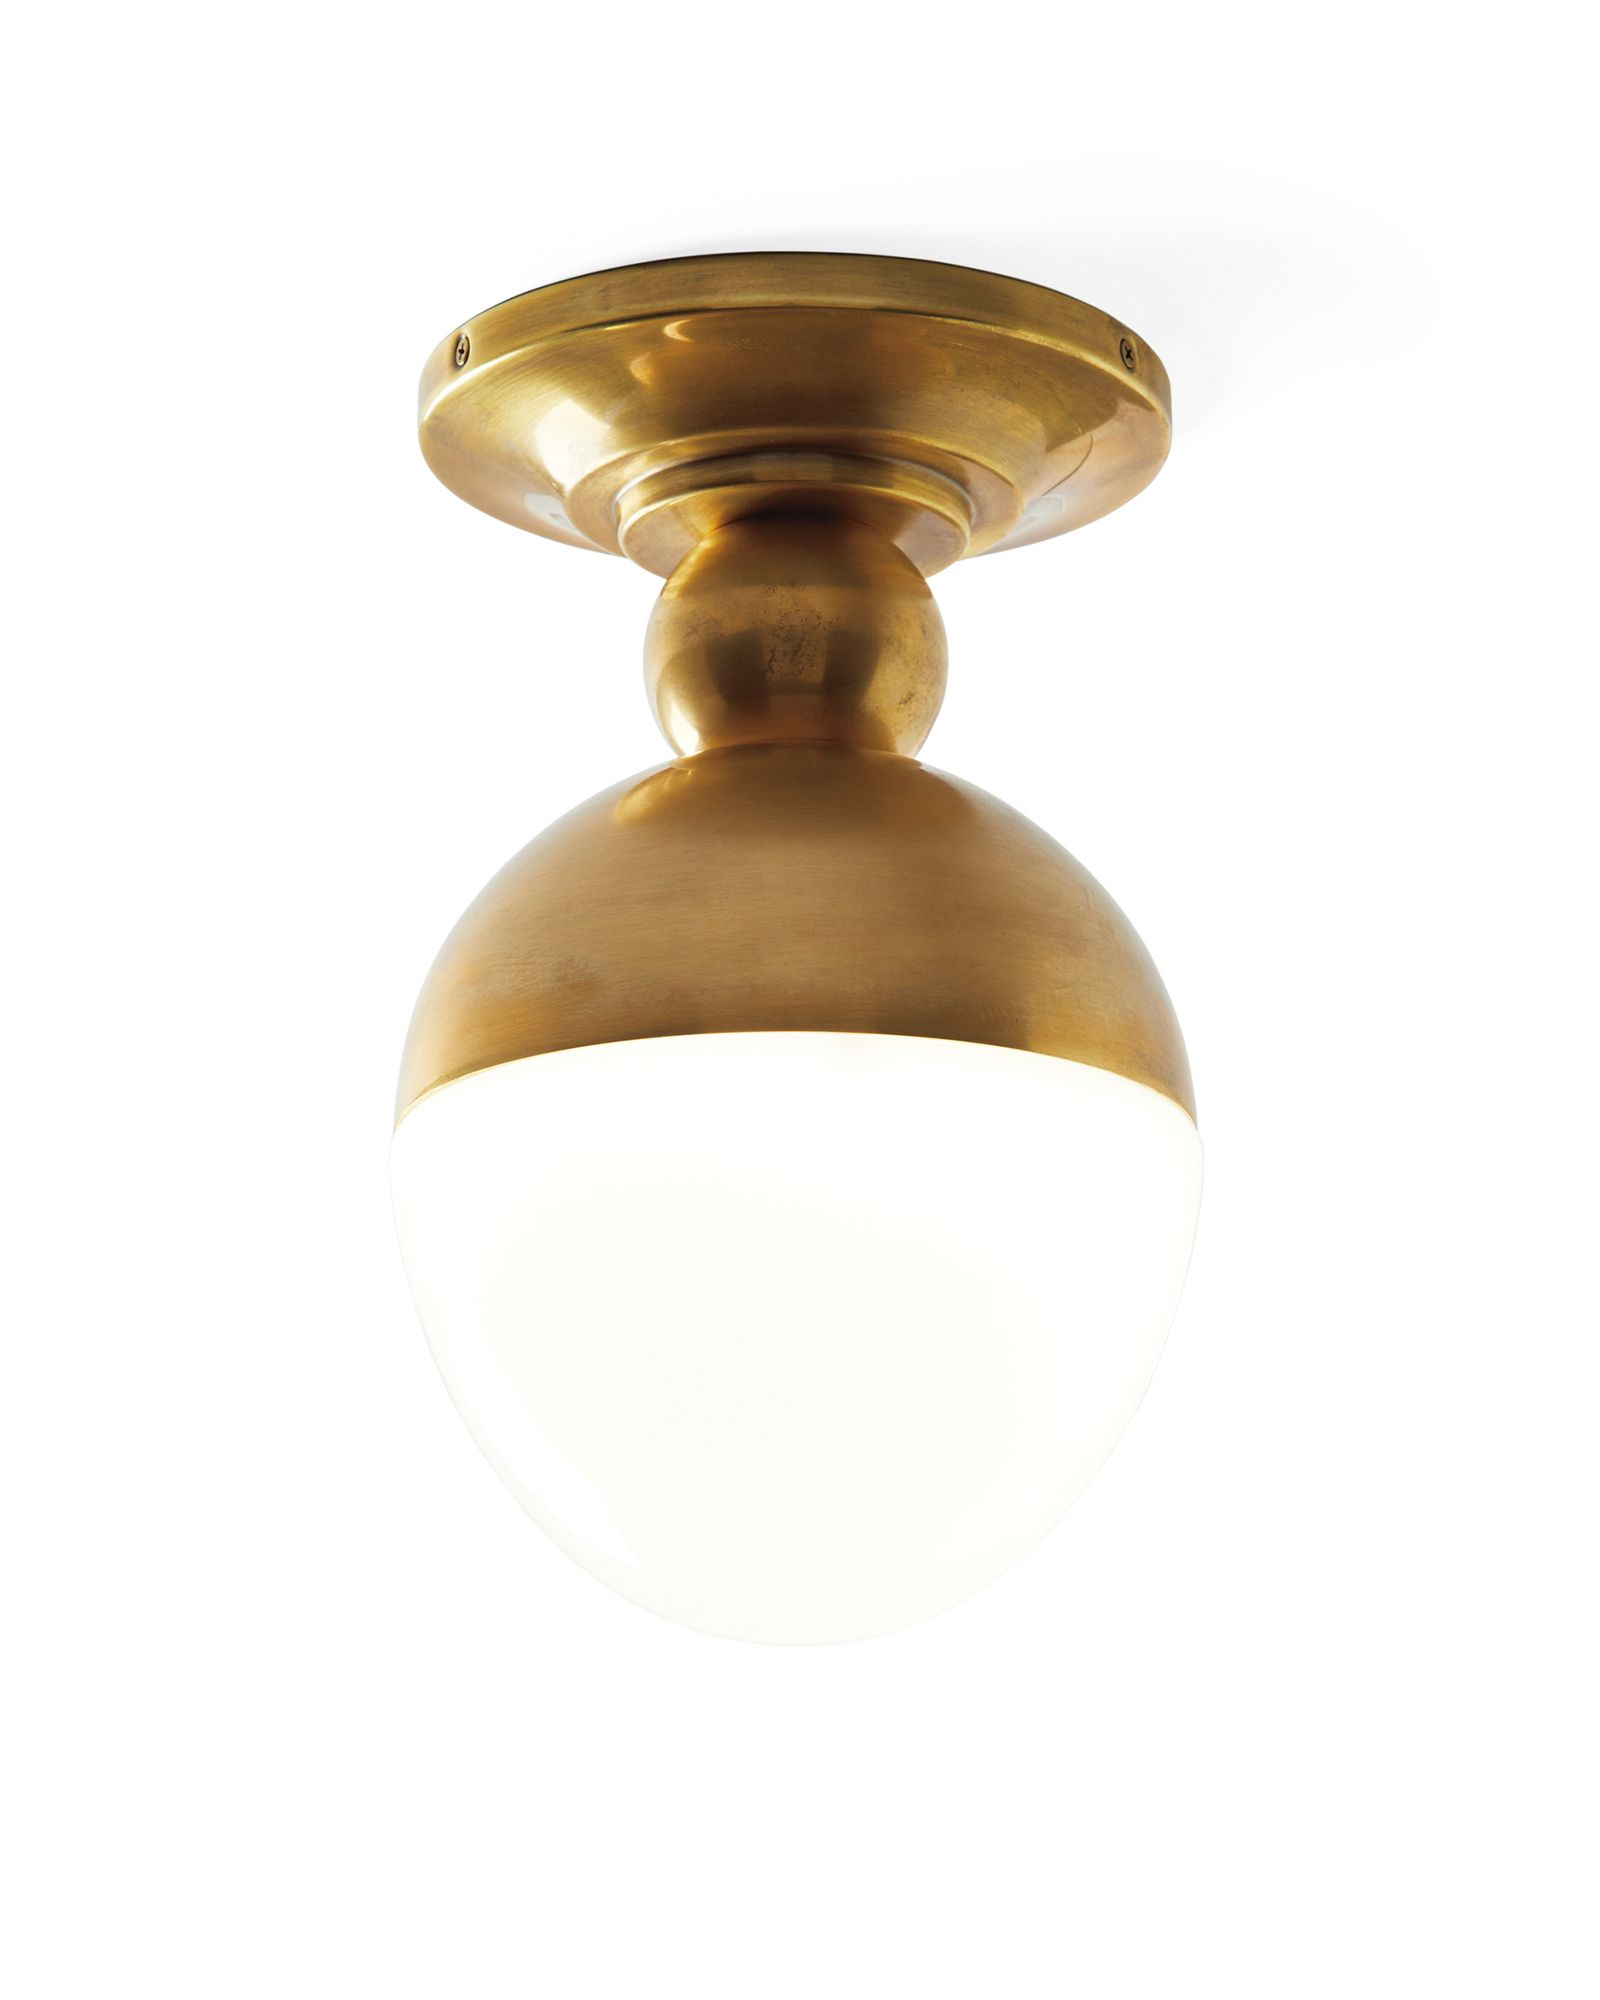 Clark Flush Mountclark Flush Mount Antique Brass Bathroom Light Fixtures Ceiling Lighting And Ceiling Fans Wall Mounted Light